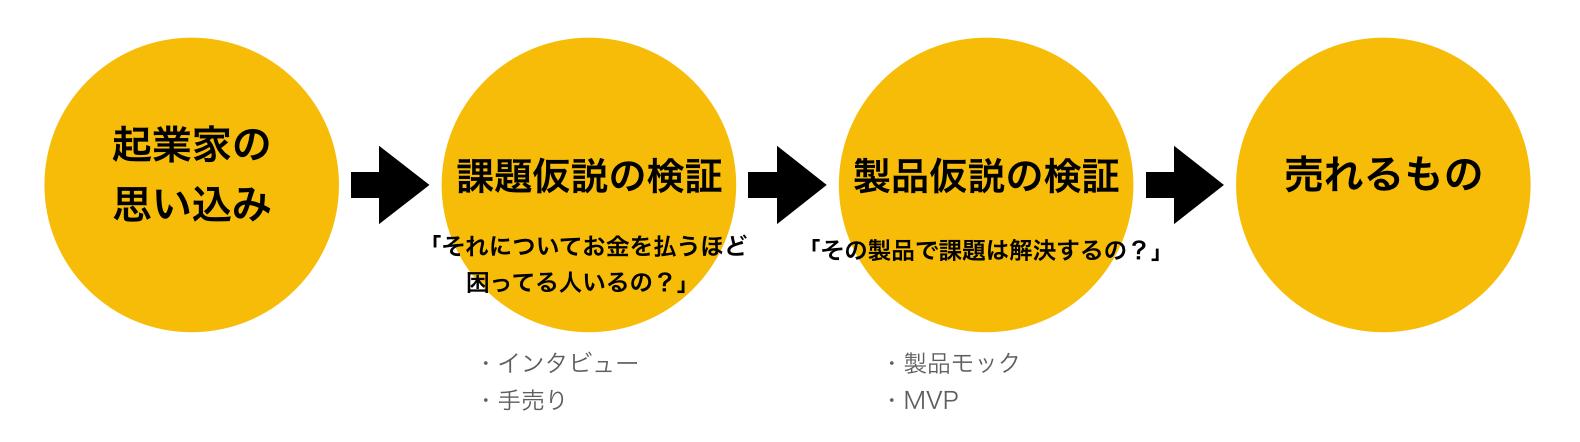 f:id:toyoshi:20180712095222p:plain